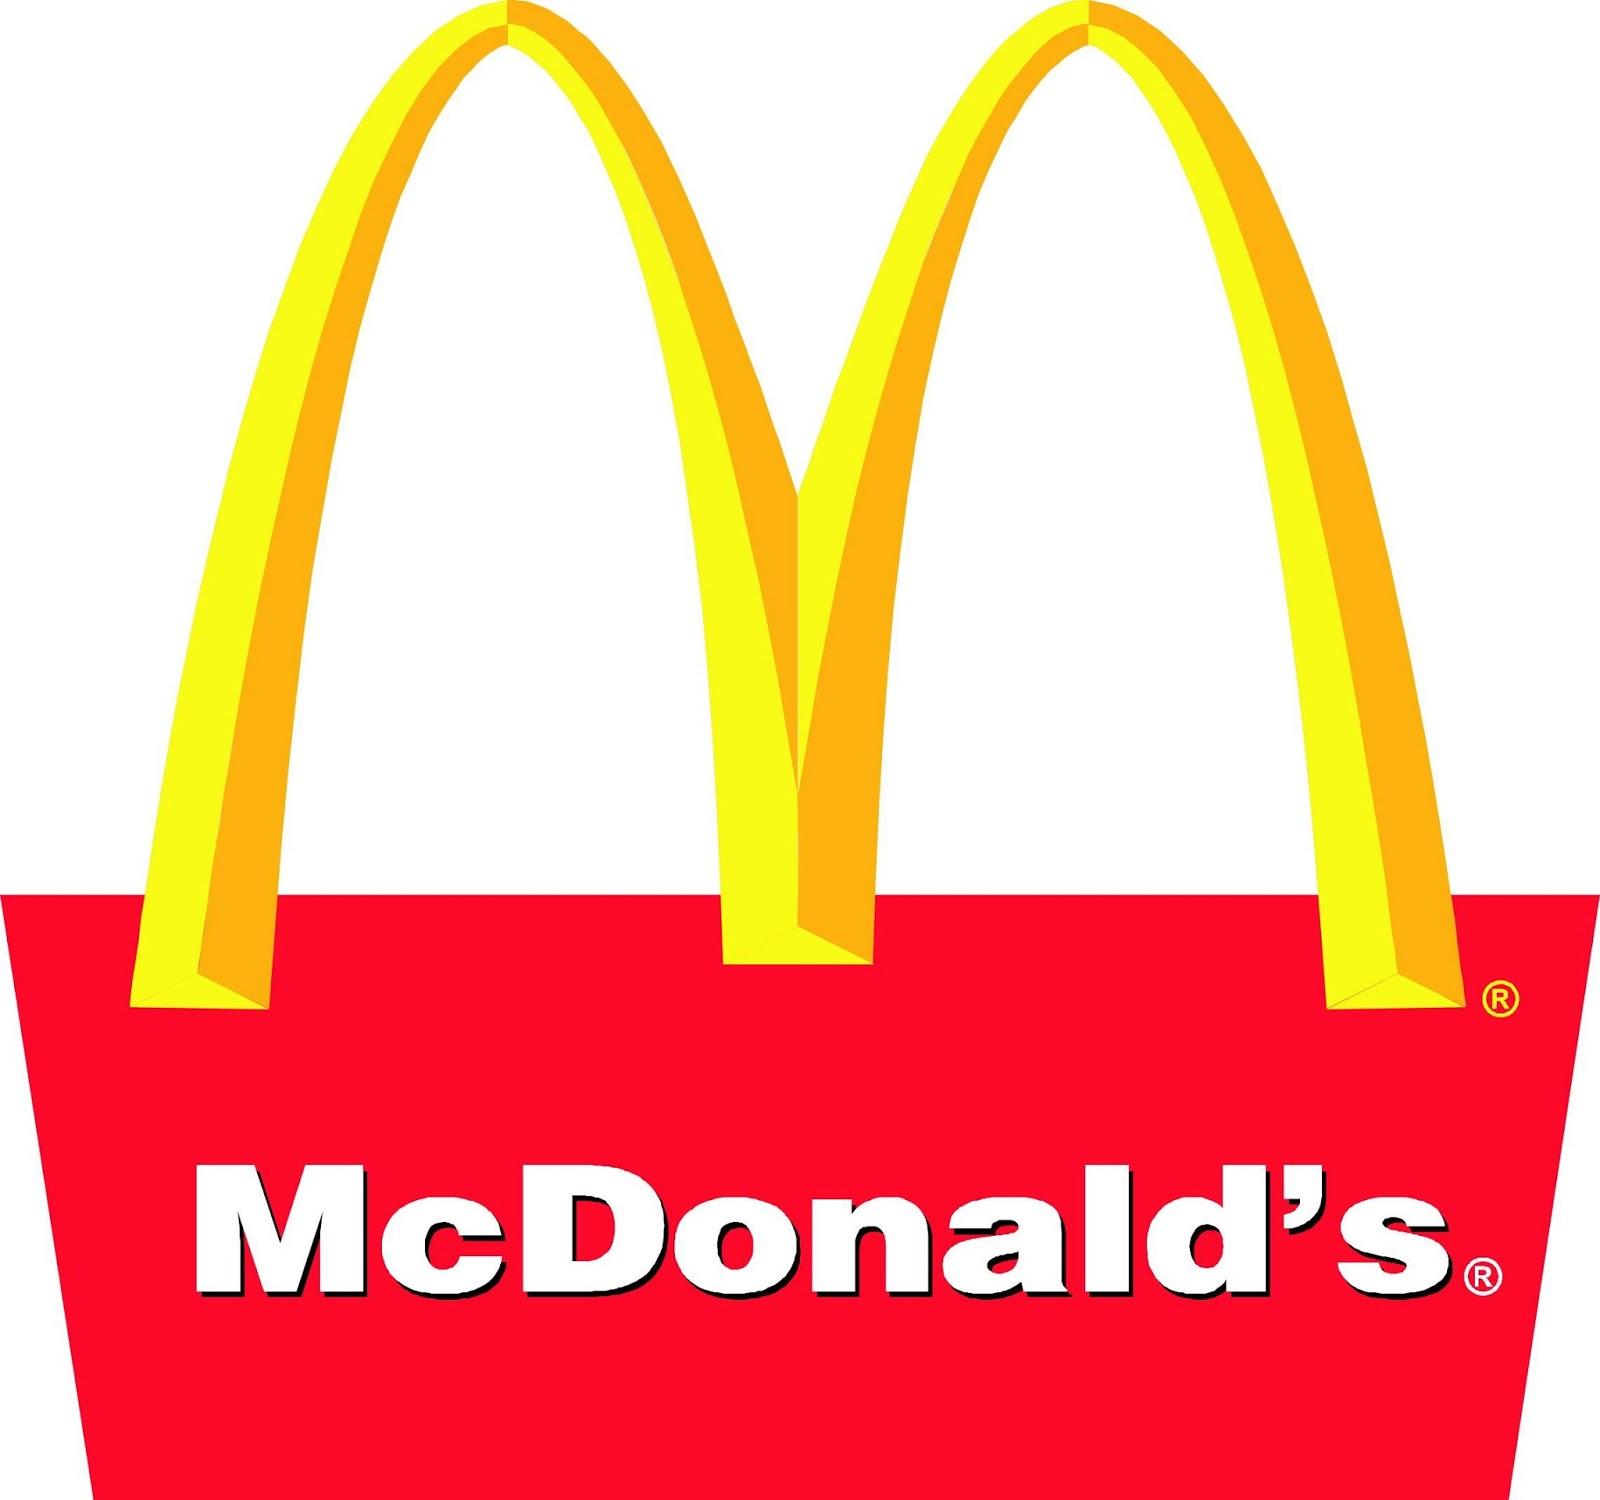 mcdonalds - photo #7